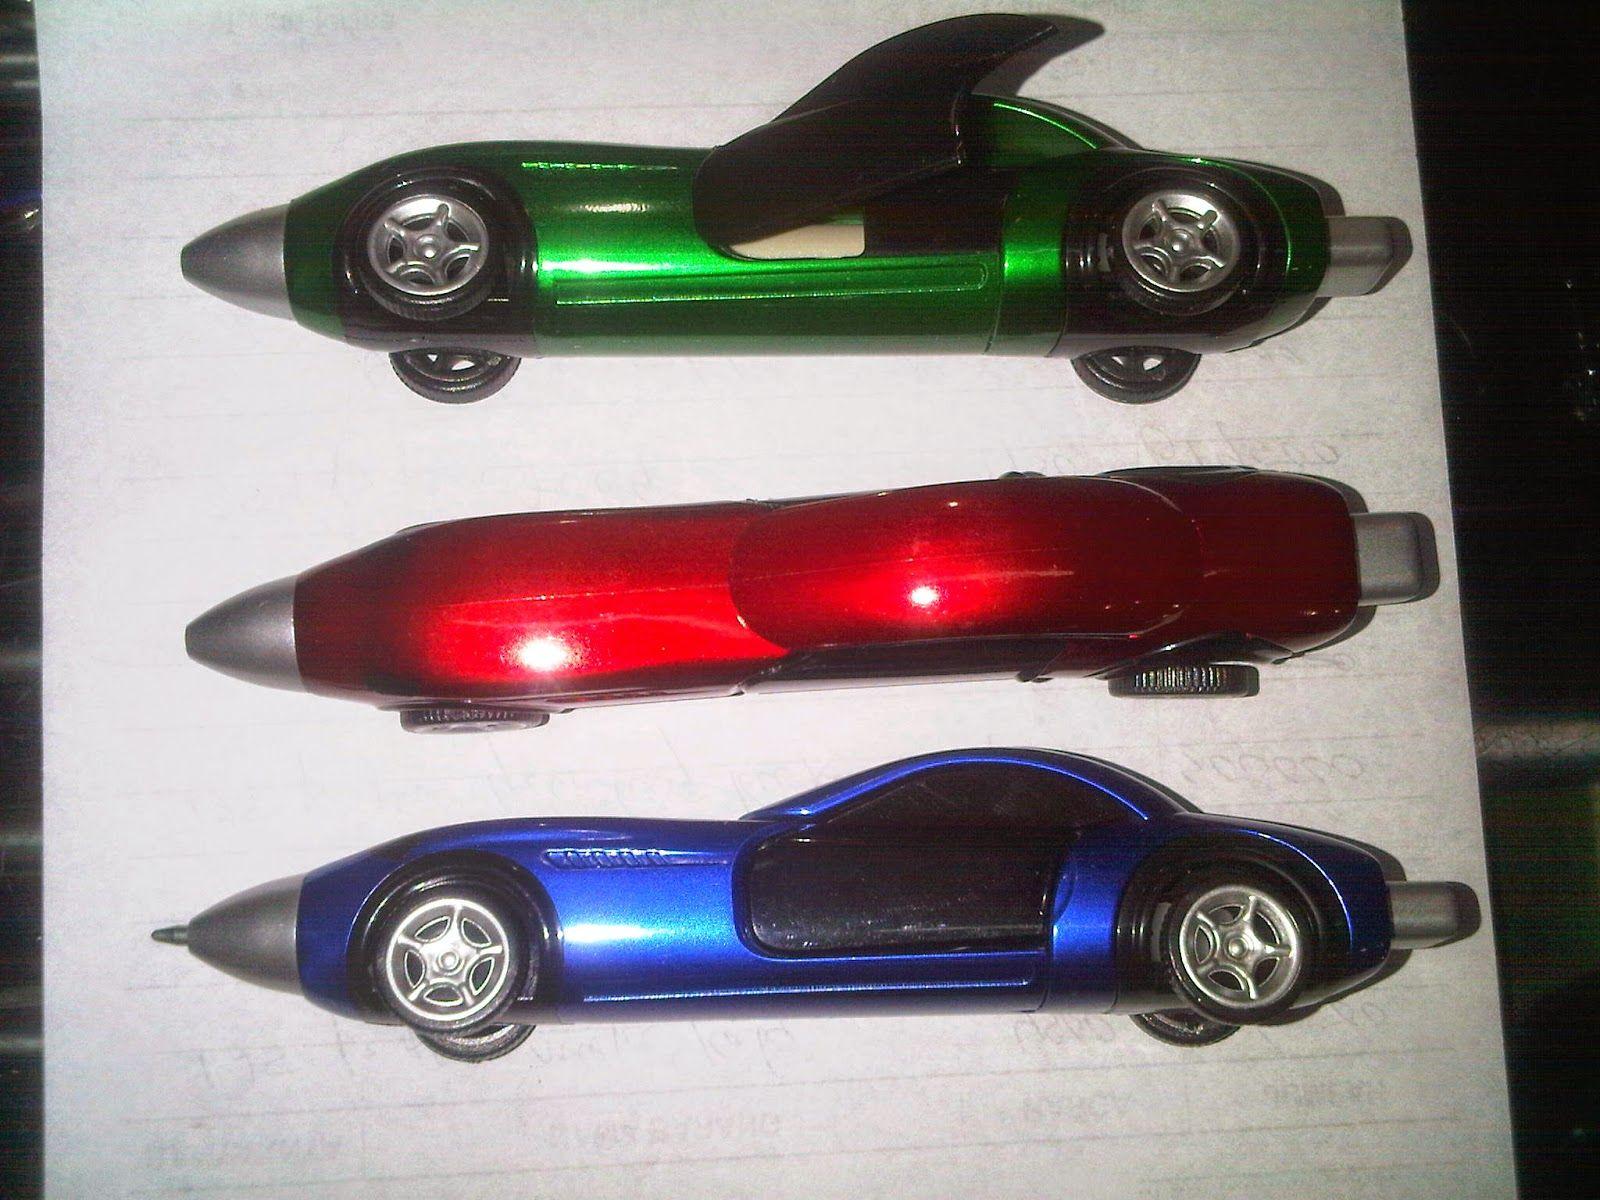 Pulpen Mobil Pen Mobil Pulpen Yang Unik Dengan Design Yang